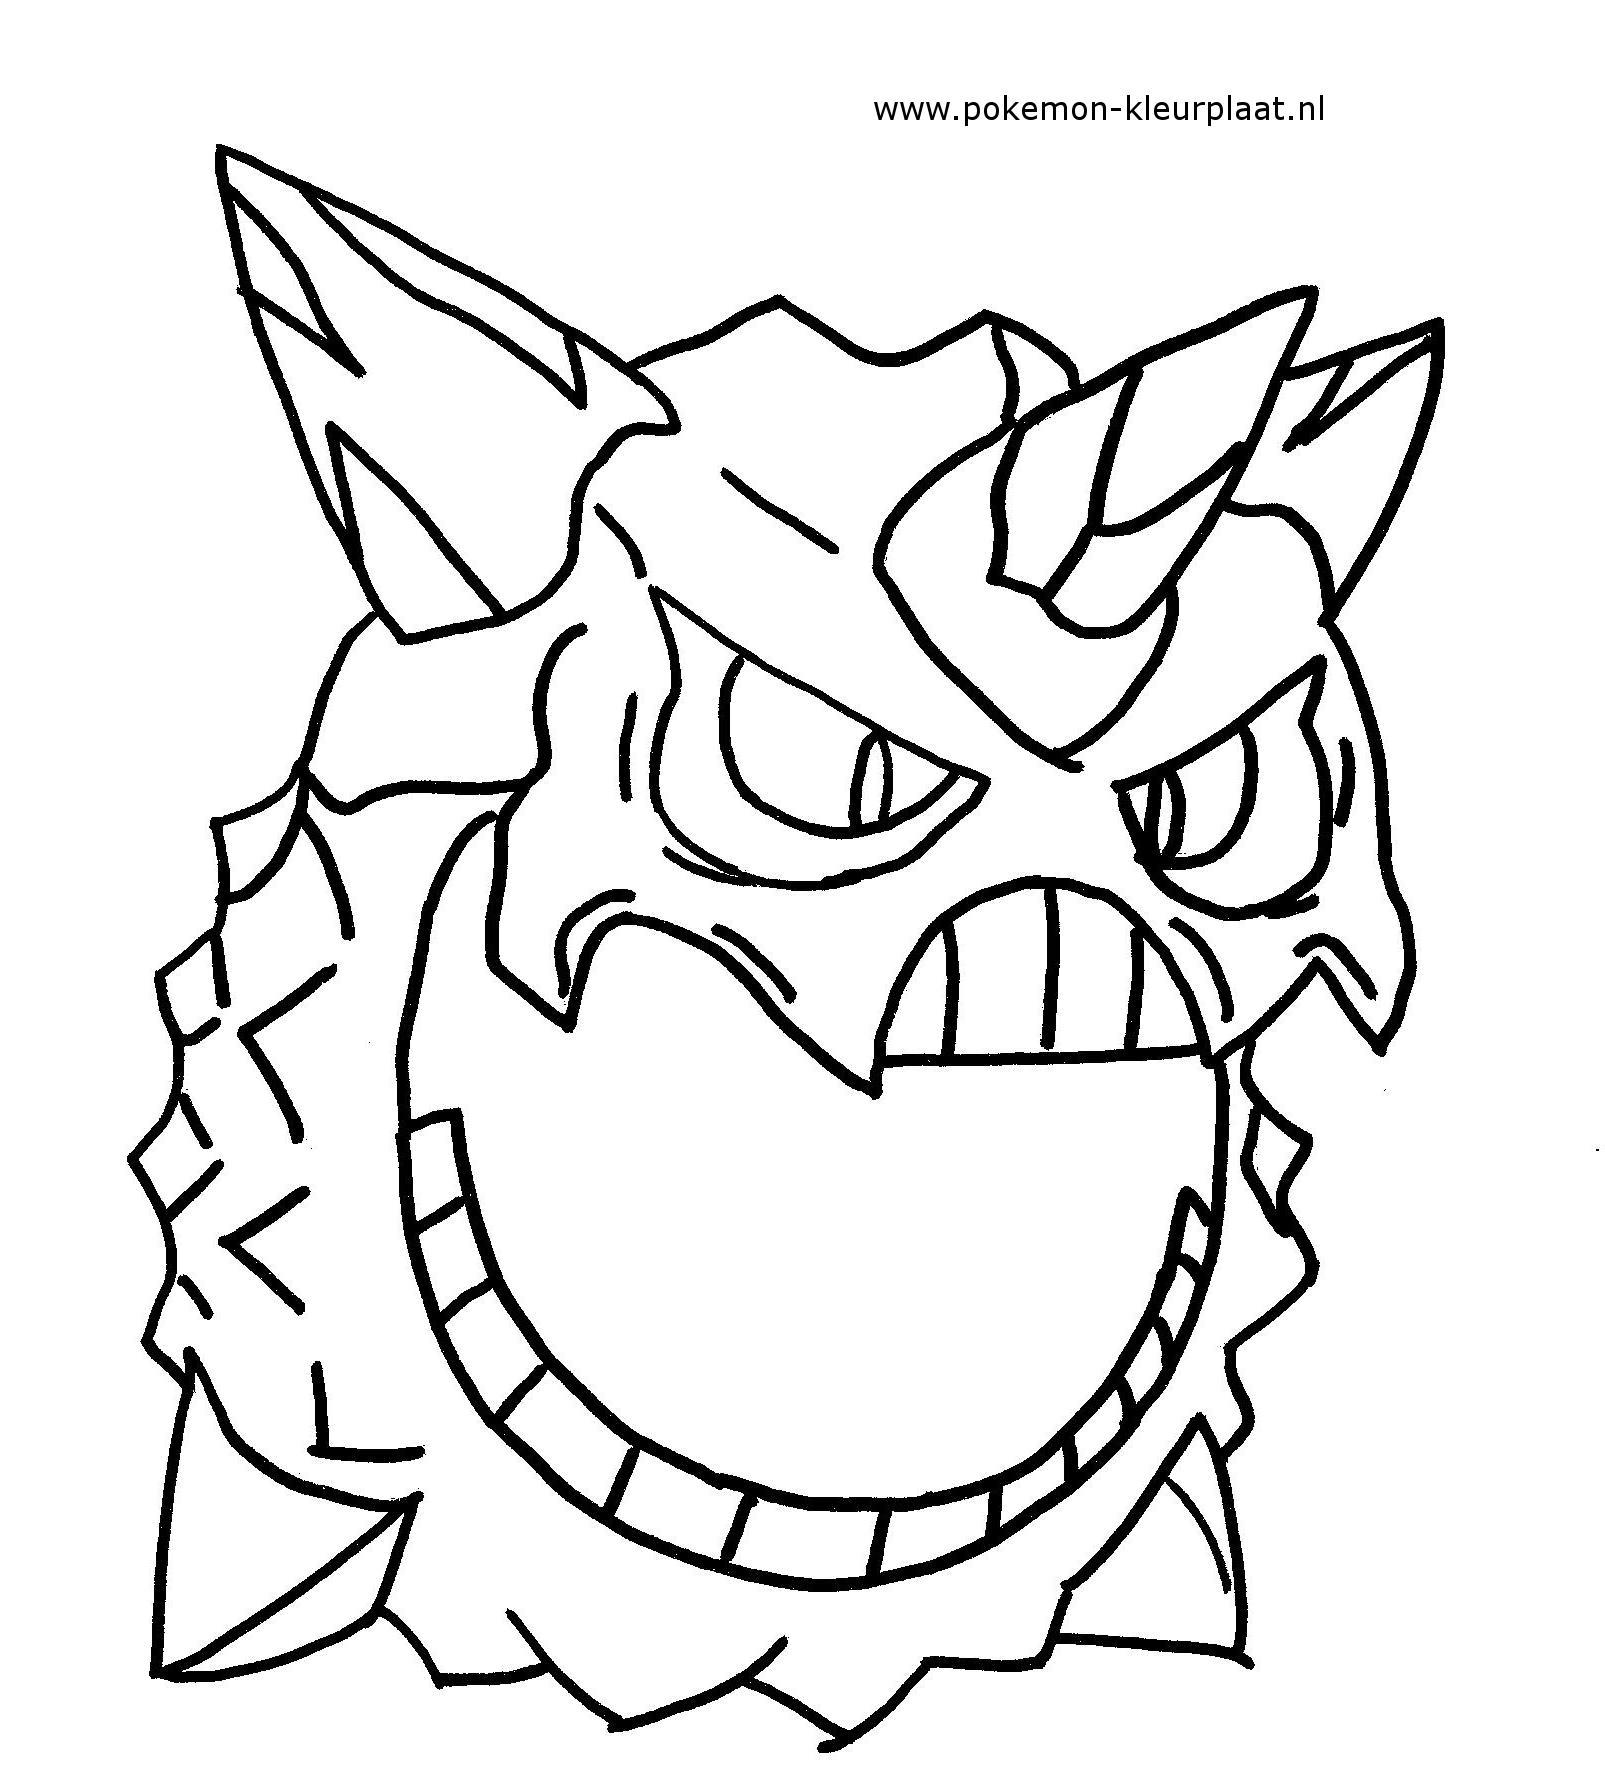 mega pokemon coloring pages | Mega Glalie Coloring Page by jpijl on DeviantArt